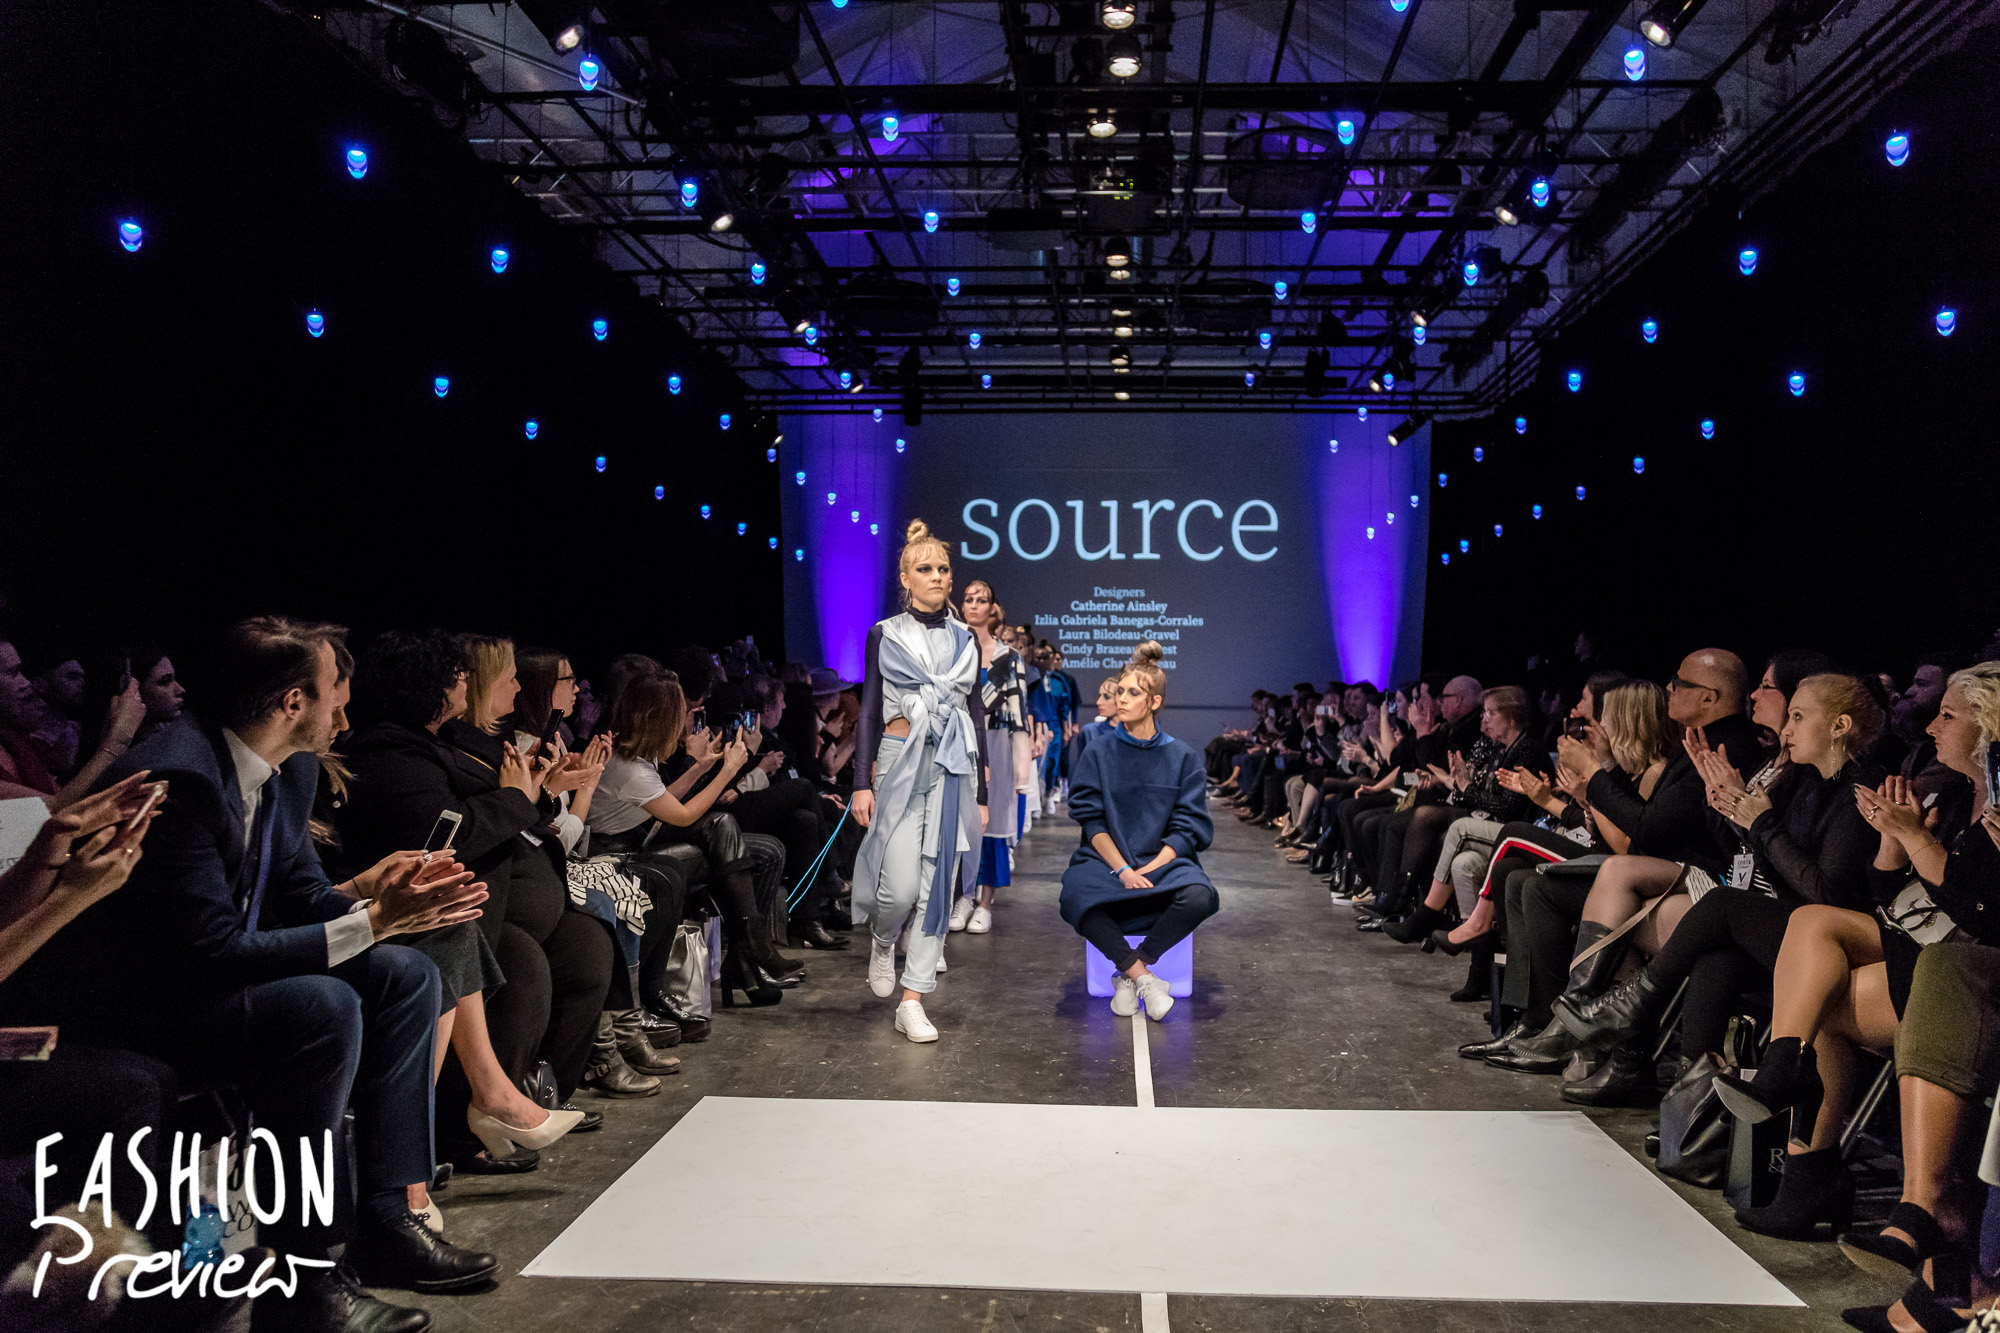 Fashion Preview 9 - Cegep Marie Victorin-22.jpg